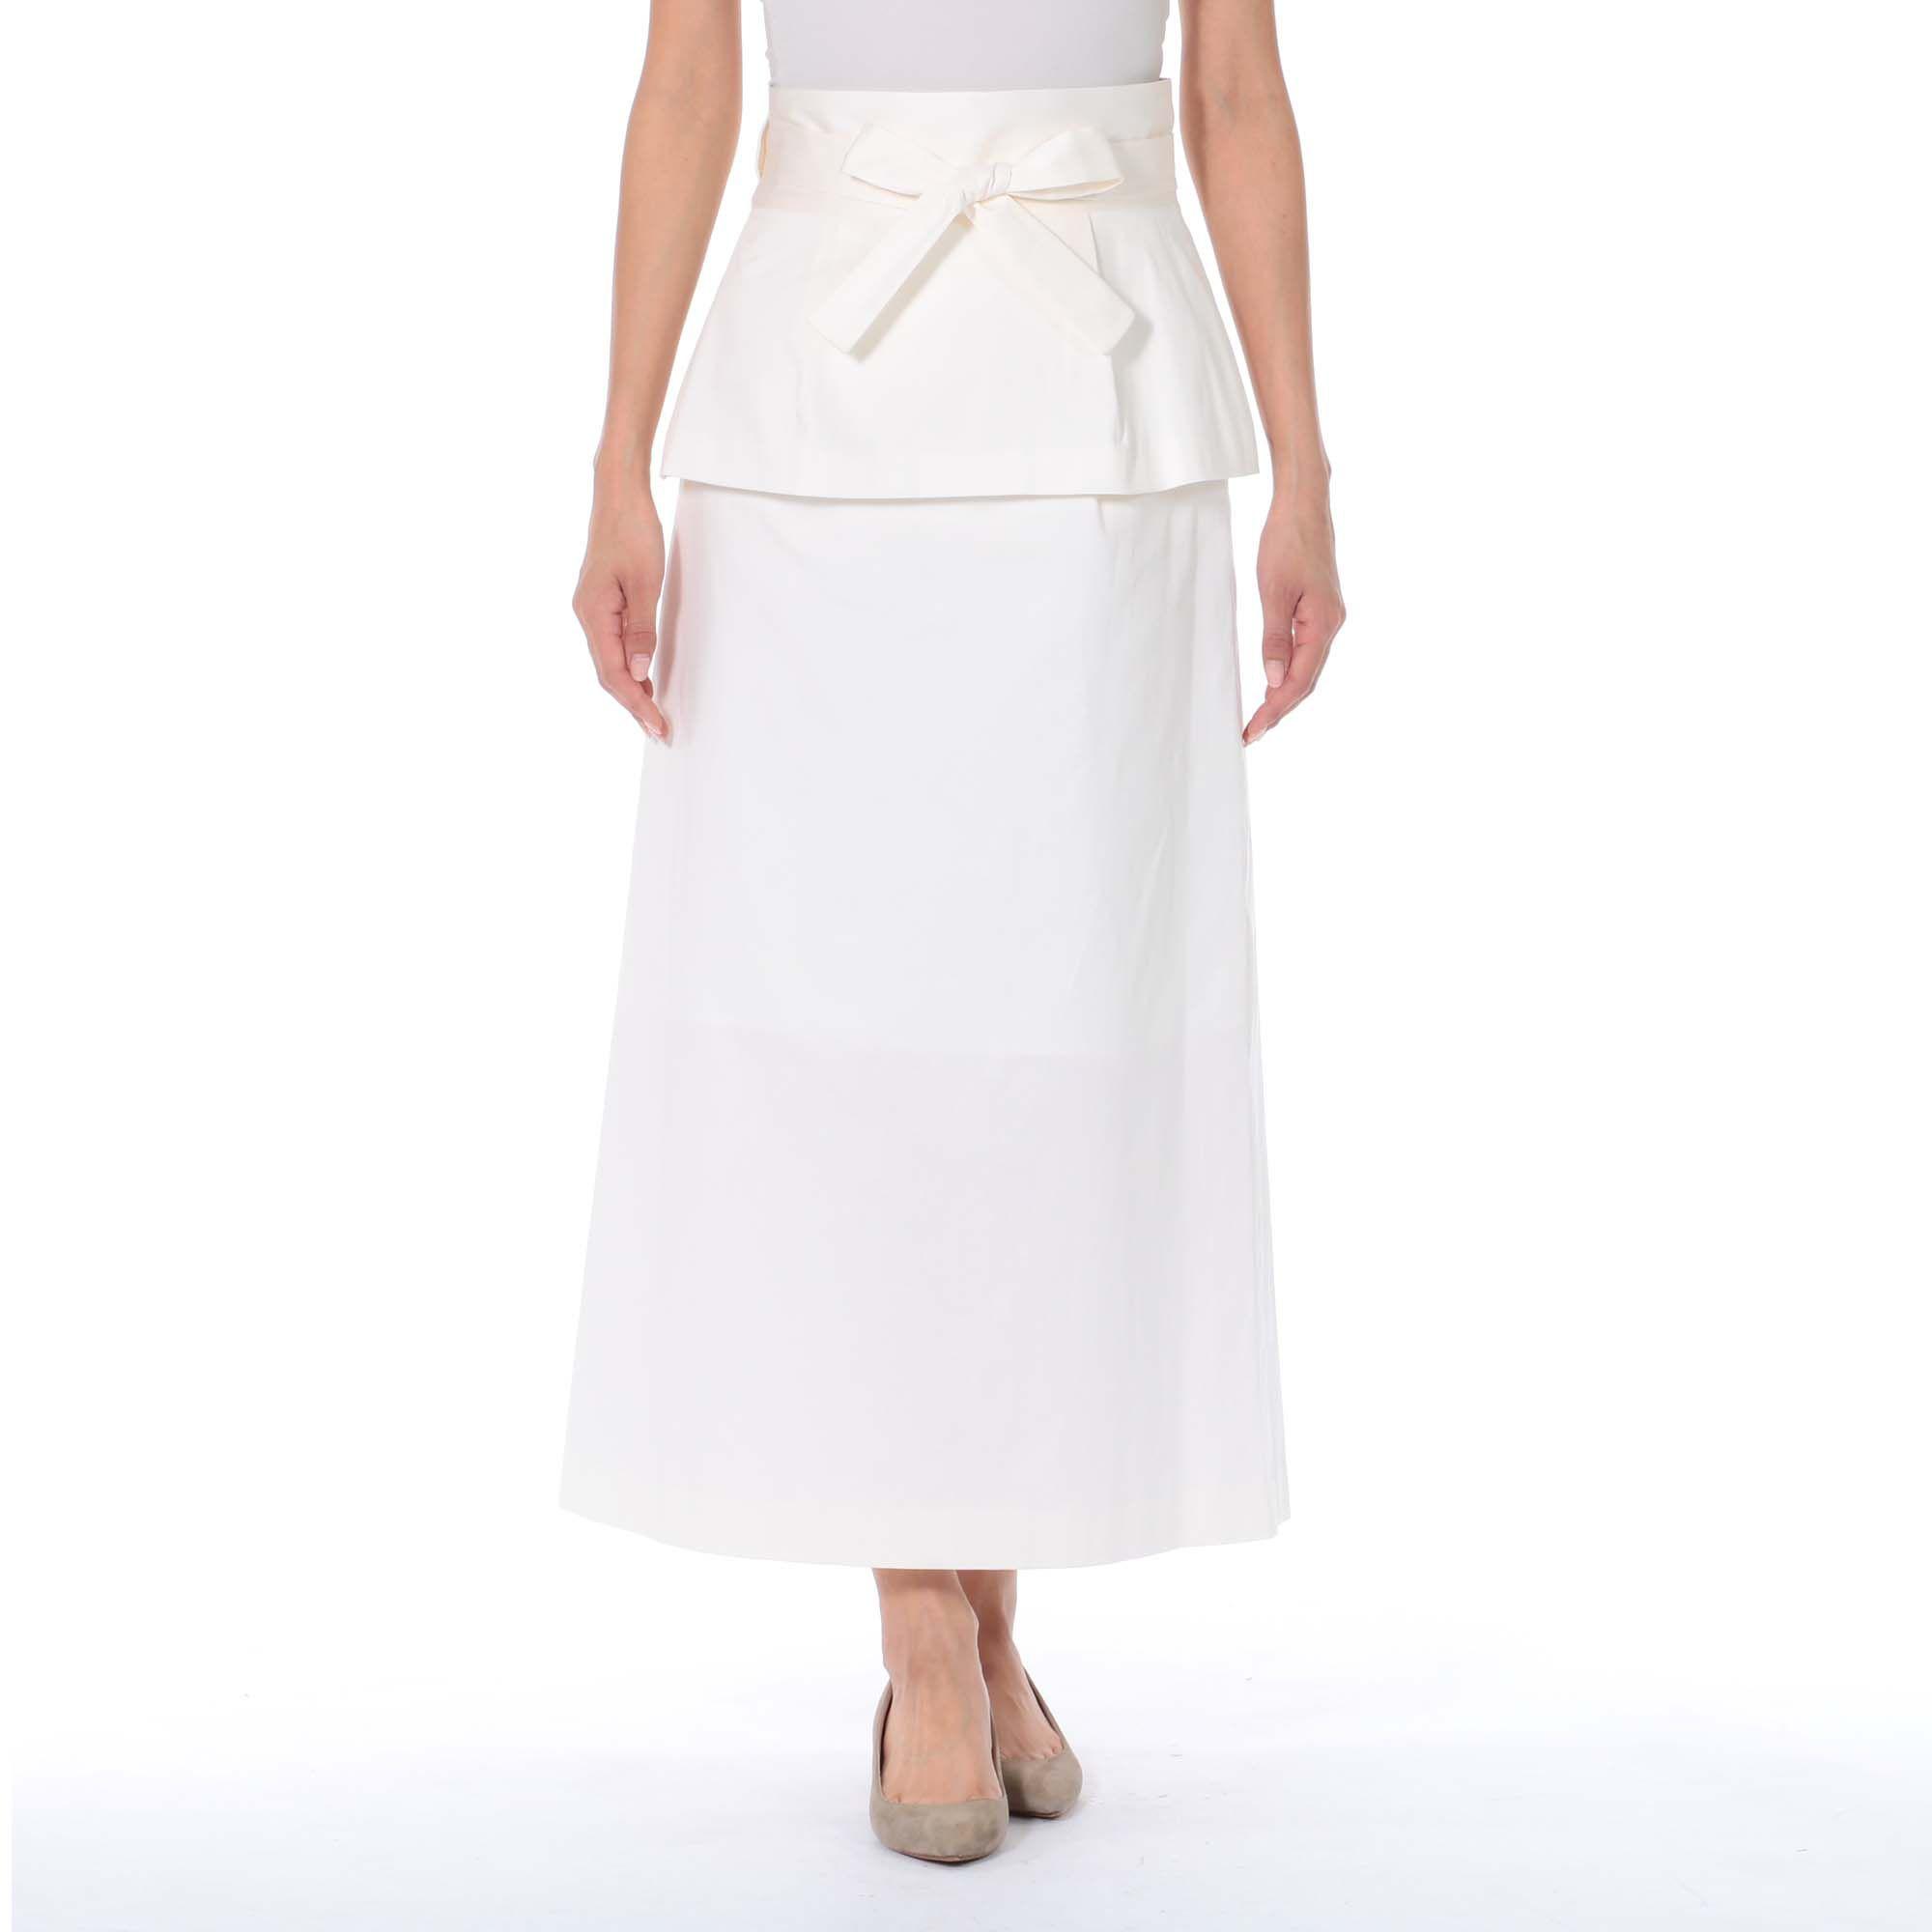 PARIGOTパリゴ/ペプラムベルト付きロングタイトスカート